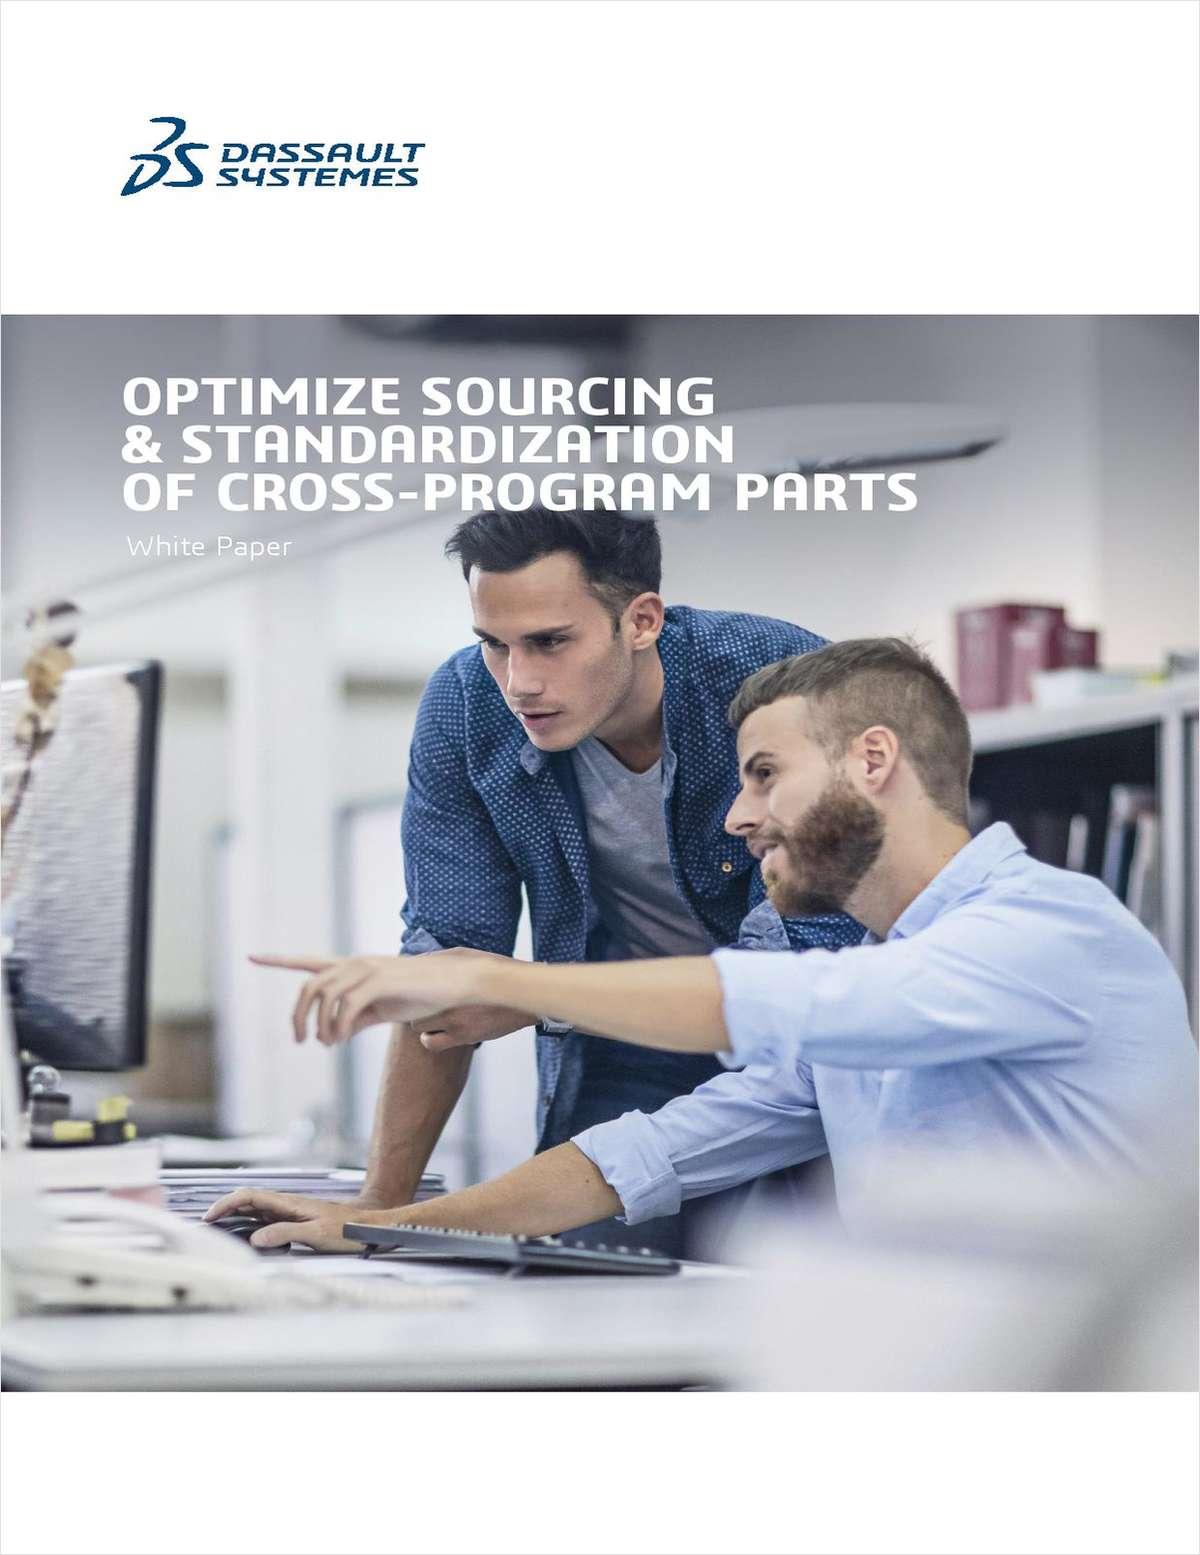 Optimize Sourcing & Standardization of Cross-Program Parts